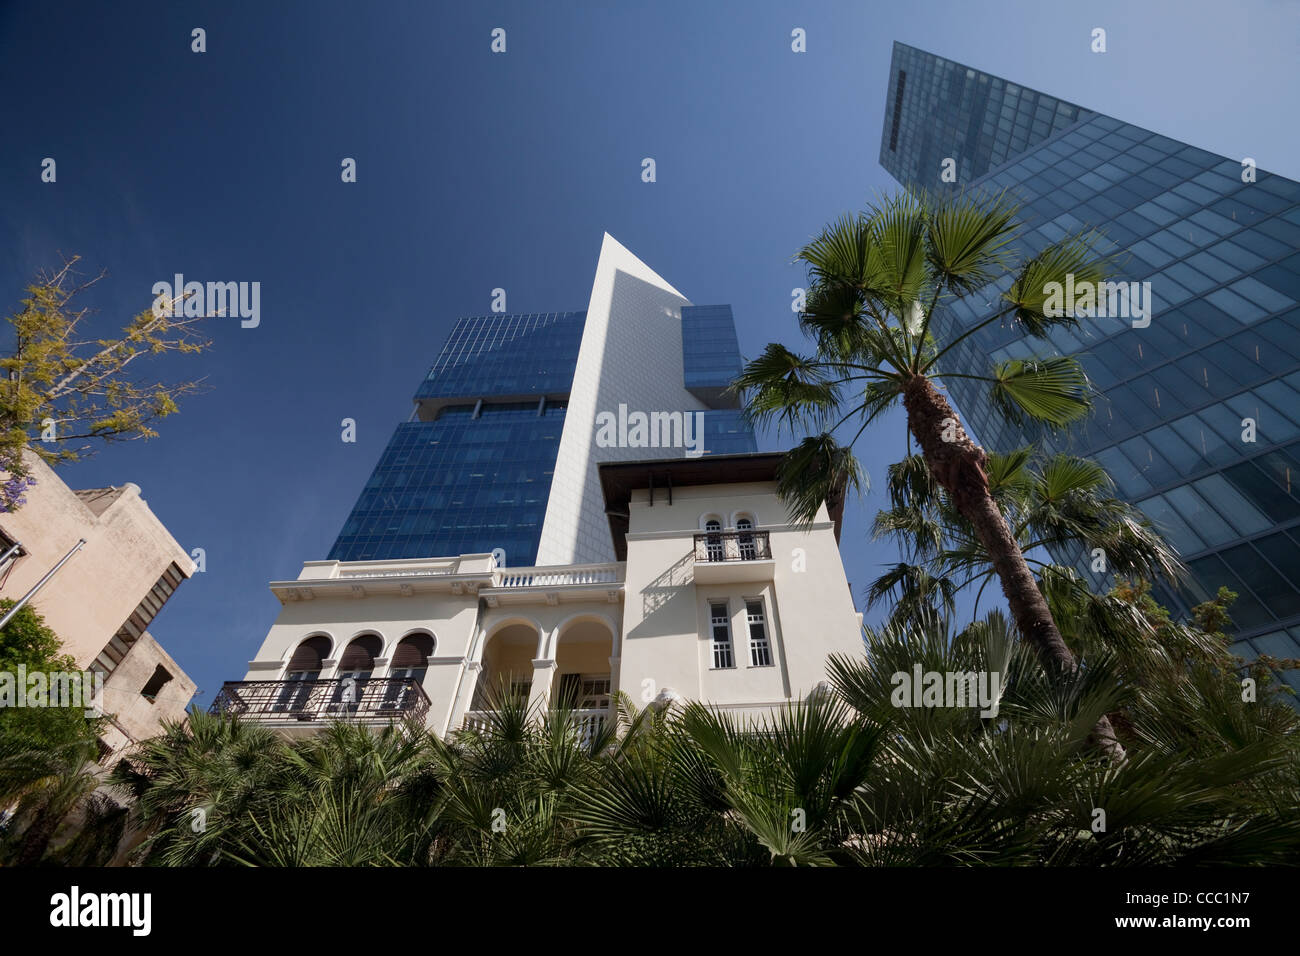 19th century villa dwarfed by modern buildings on Rothschild Boulevard Tel Aviv Israel - Stock Image